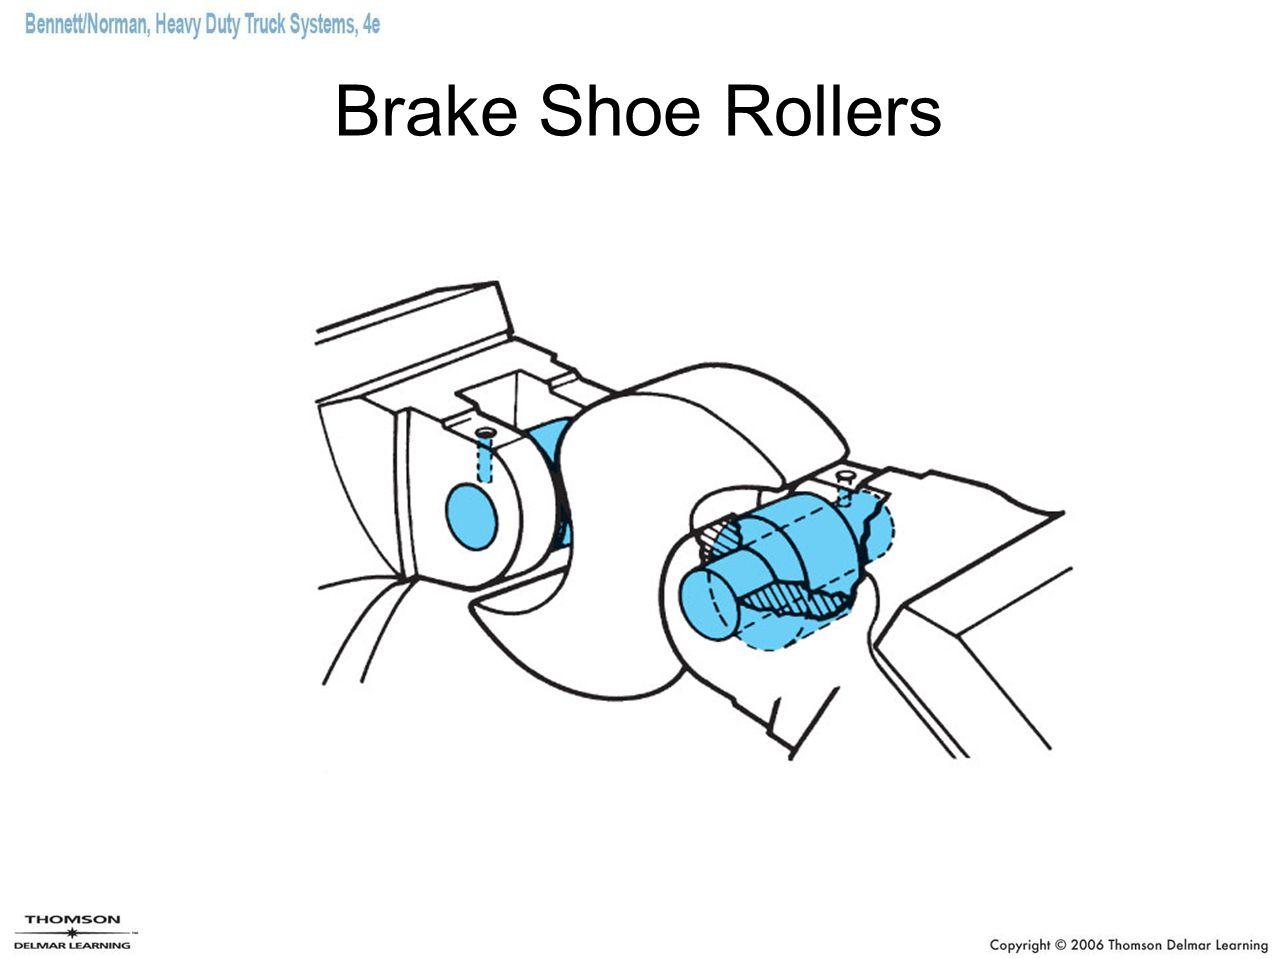 Brake Shoe Rollers